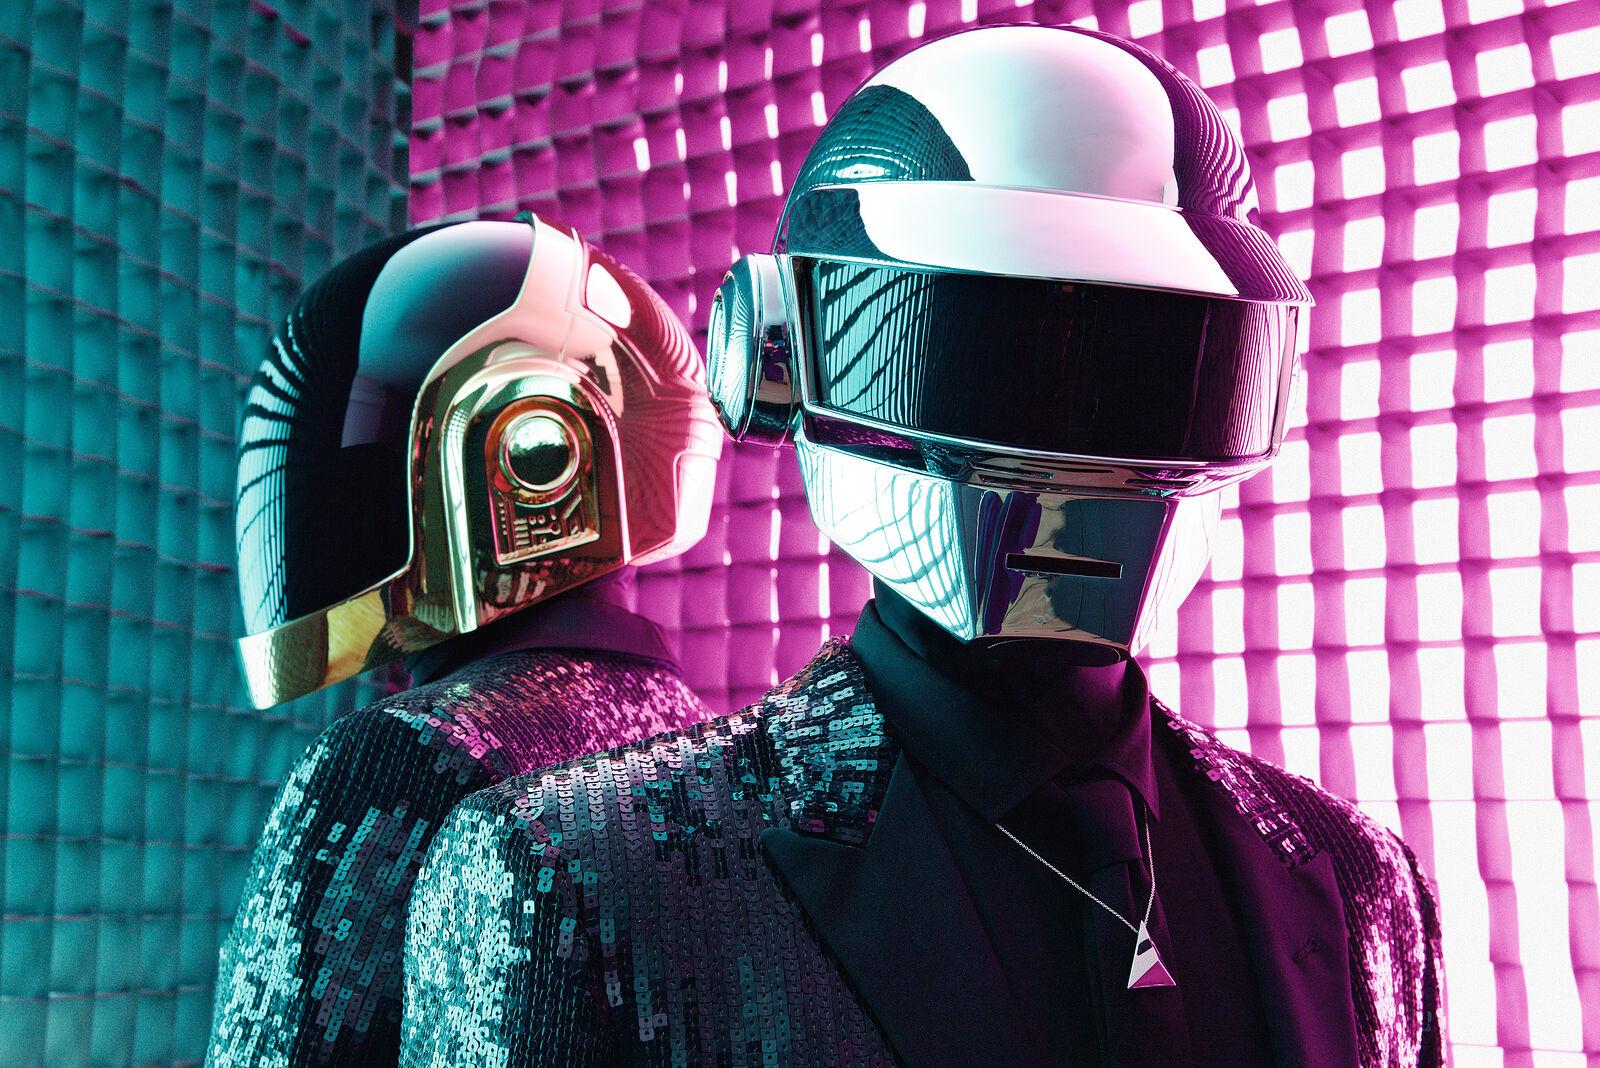 Daft Punk: Limited Edition Fine Art Print